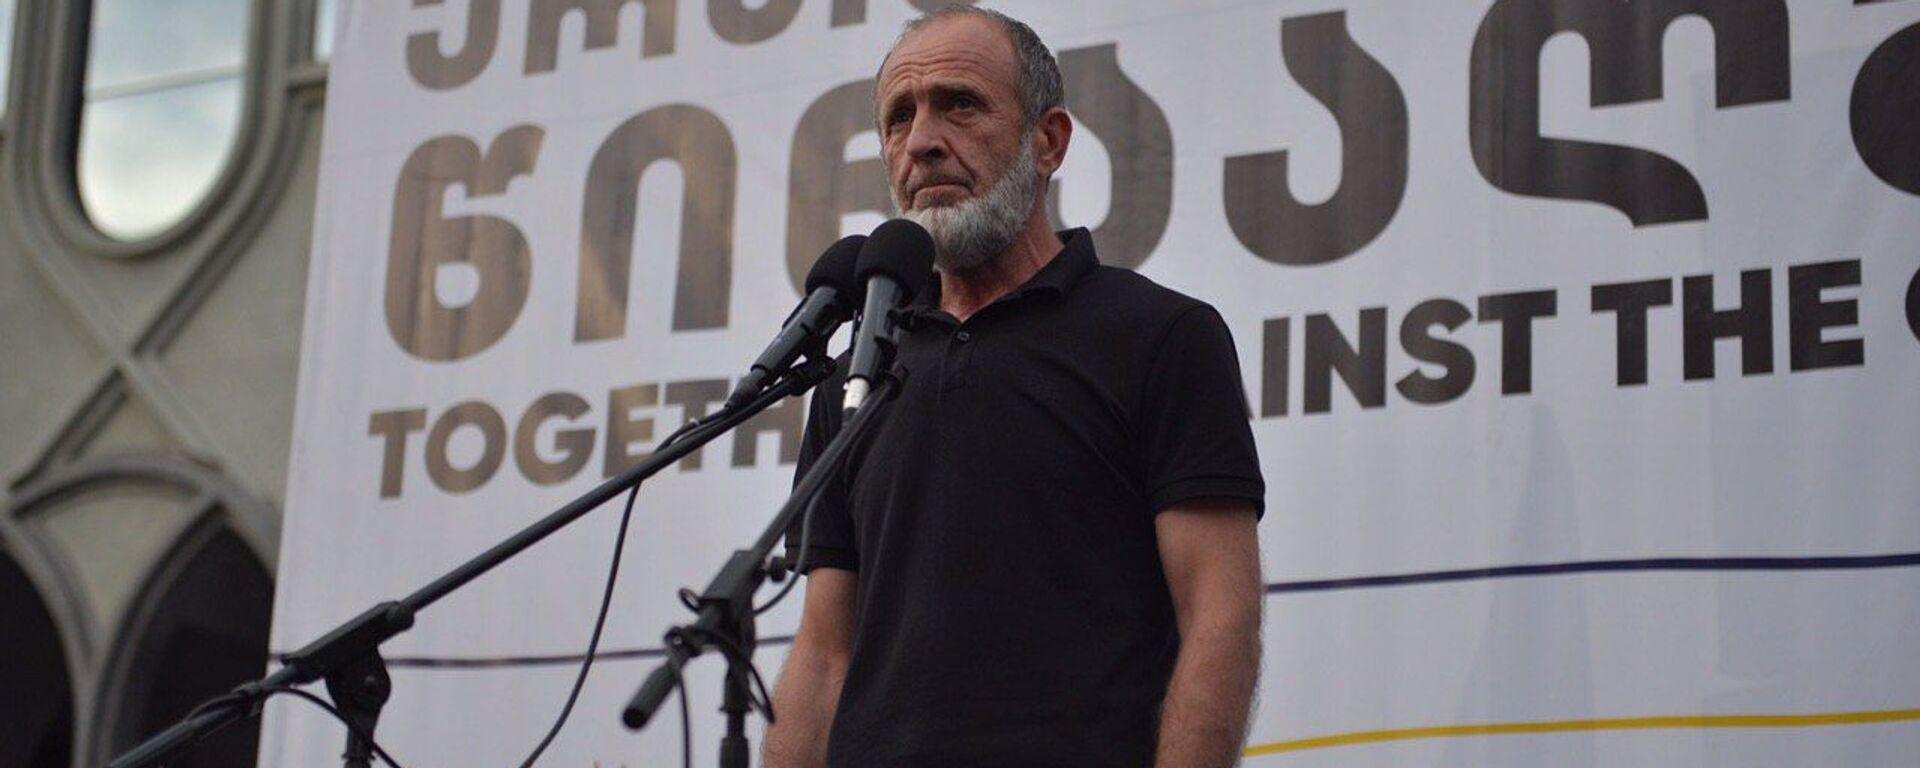 Акция протеста оппозиции у здания парламента 20 июня 2020 года. Малхаз Мачаликашвили - Sputnik Грузия, 1920, 25.08.2021